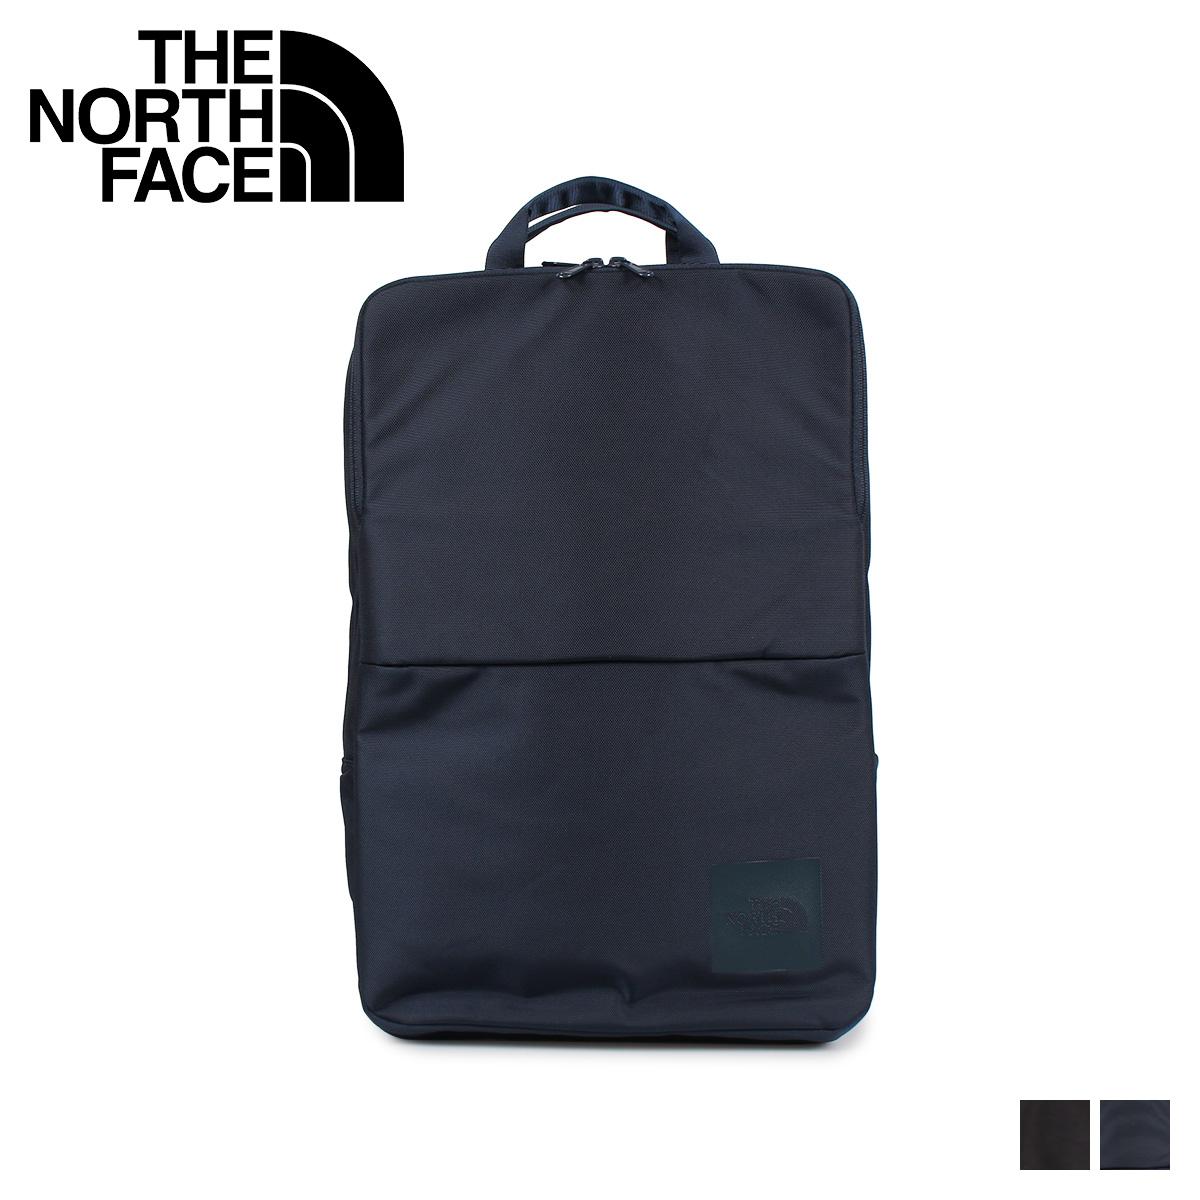 THE NORTH FACE SHUTTLE DAYPACK ノースフェイス リュック バッグ バックパック シャトル デイパック メンズ レディース シャトルデイパック 25L ブラック ネイビー 黒 NM81863